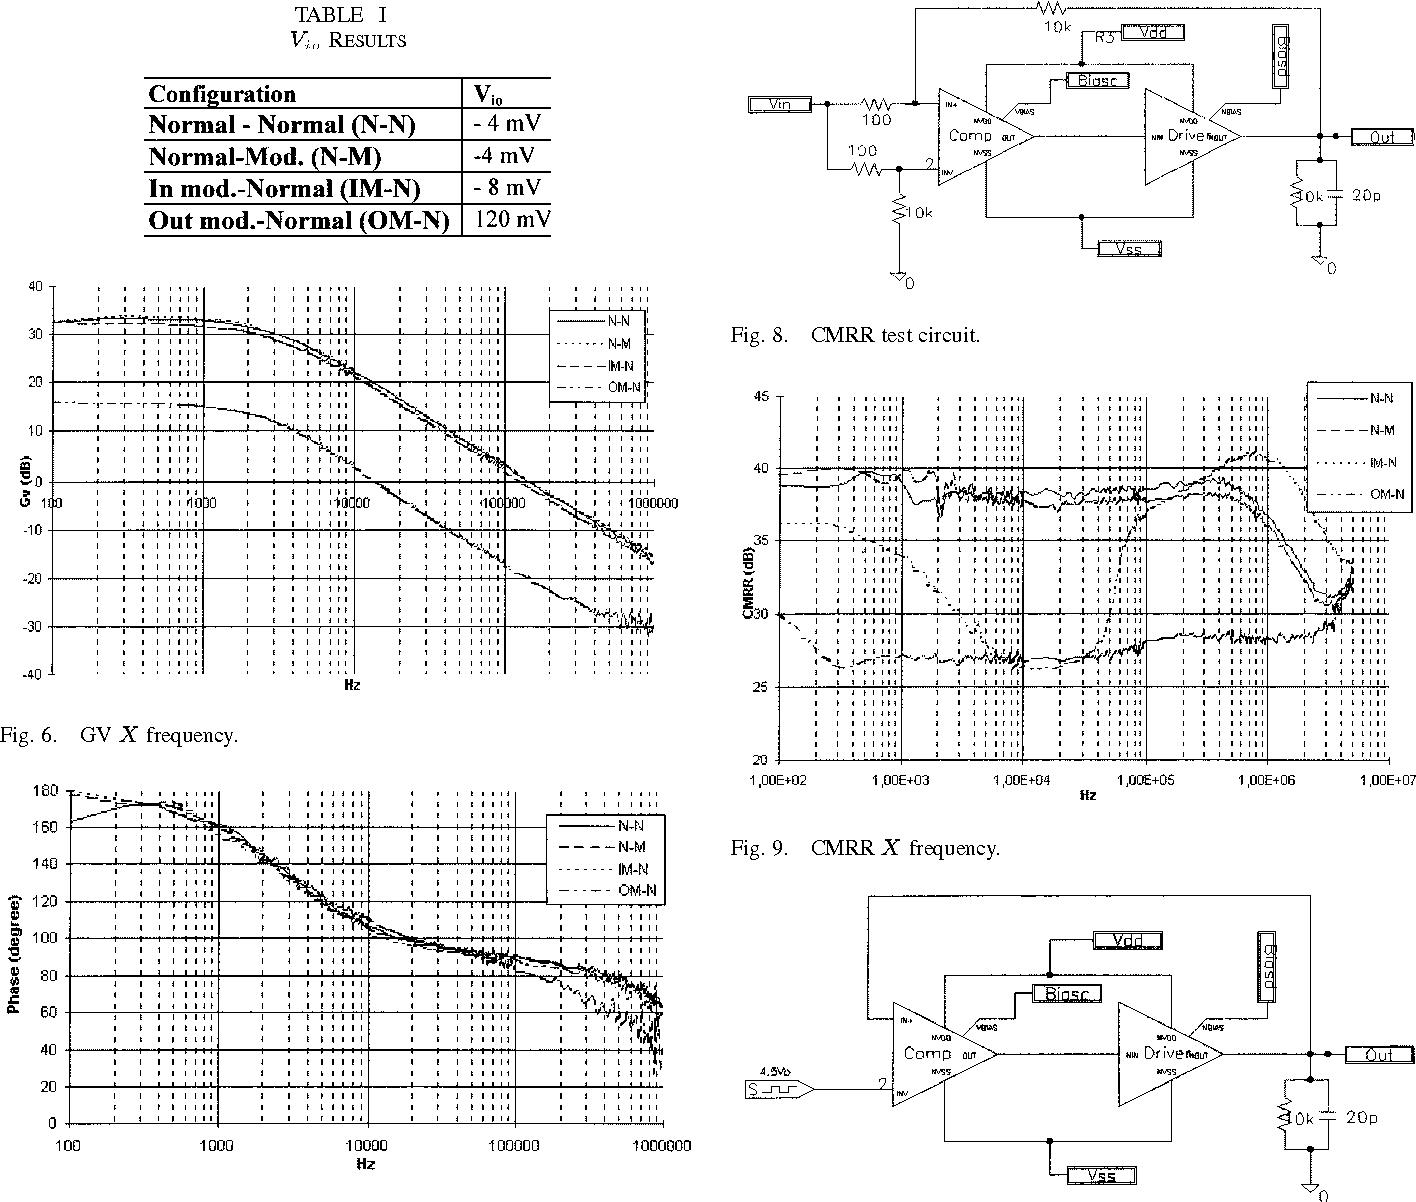 Fig. 8. CMRR test circuit.